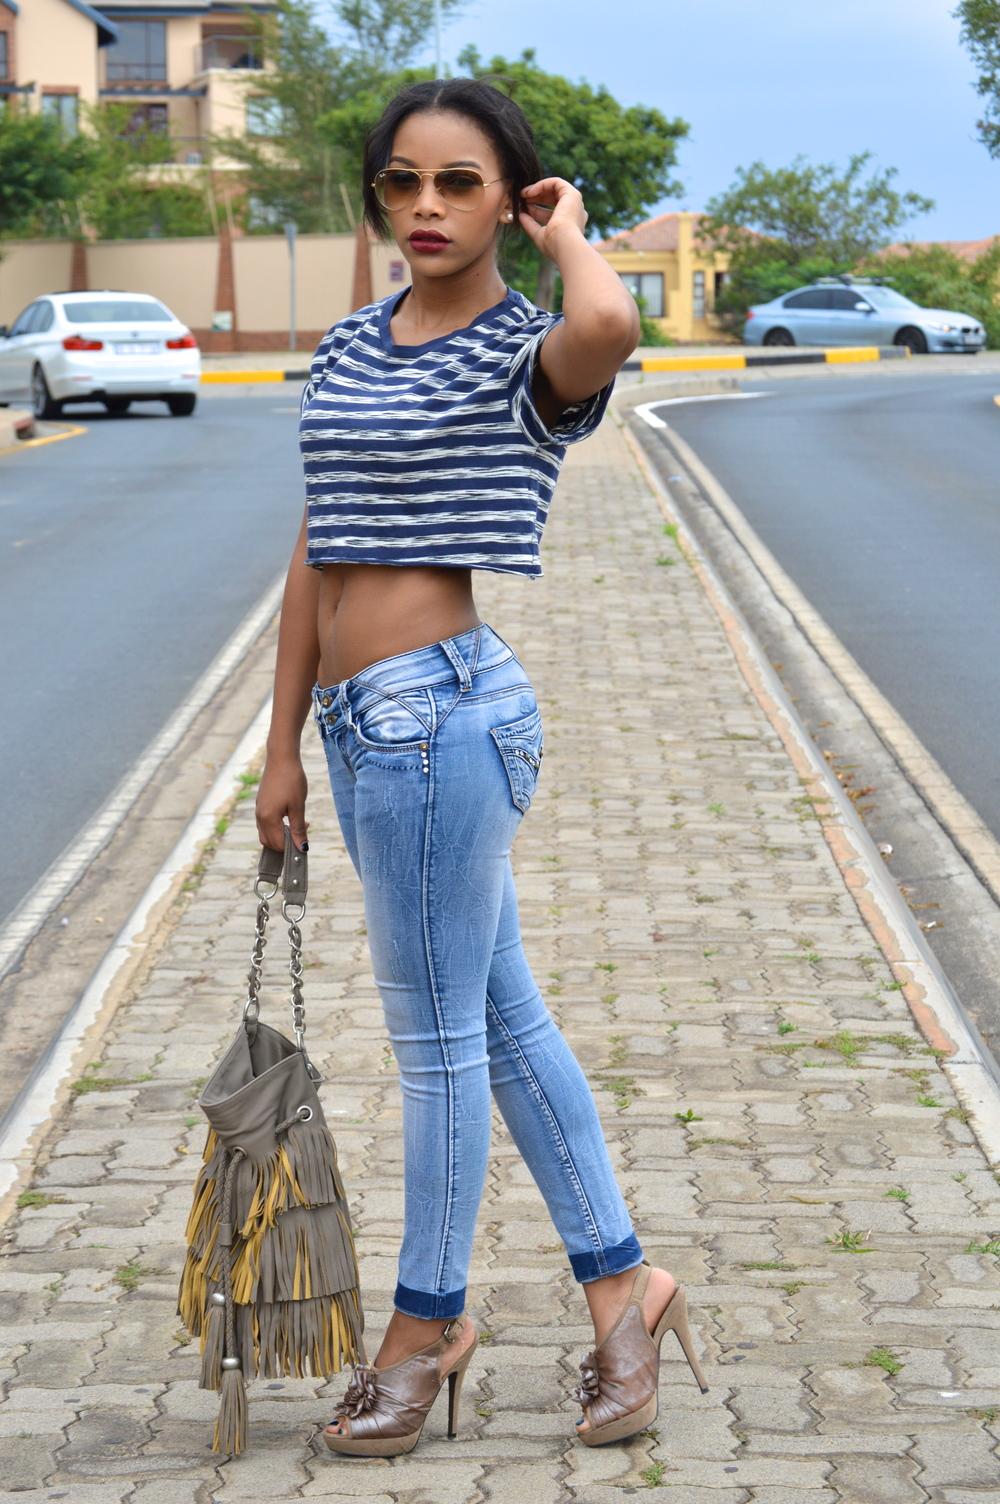 Kaylista_jeans